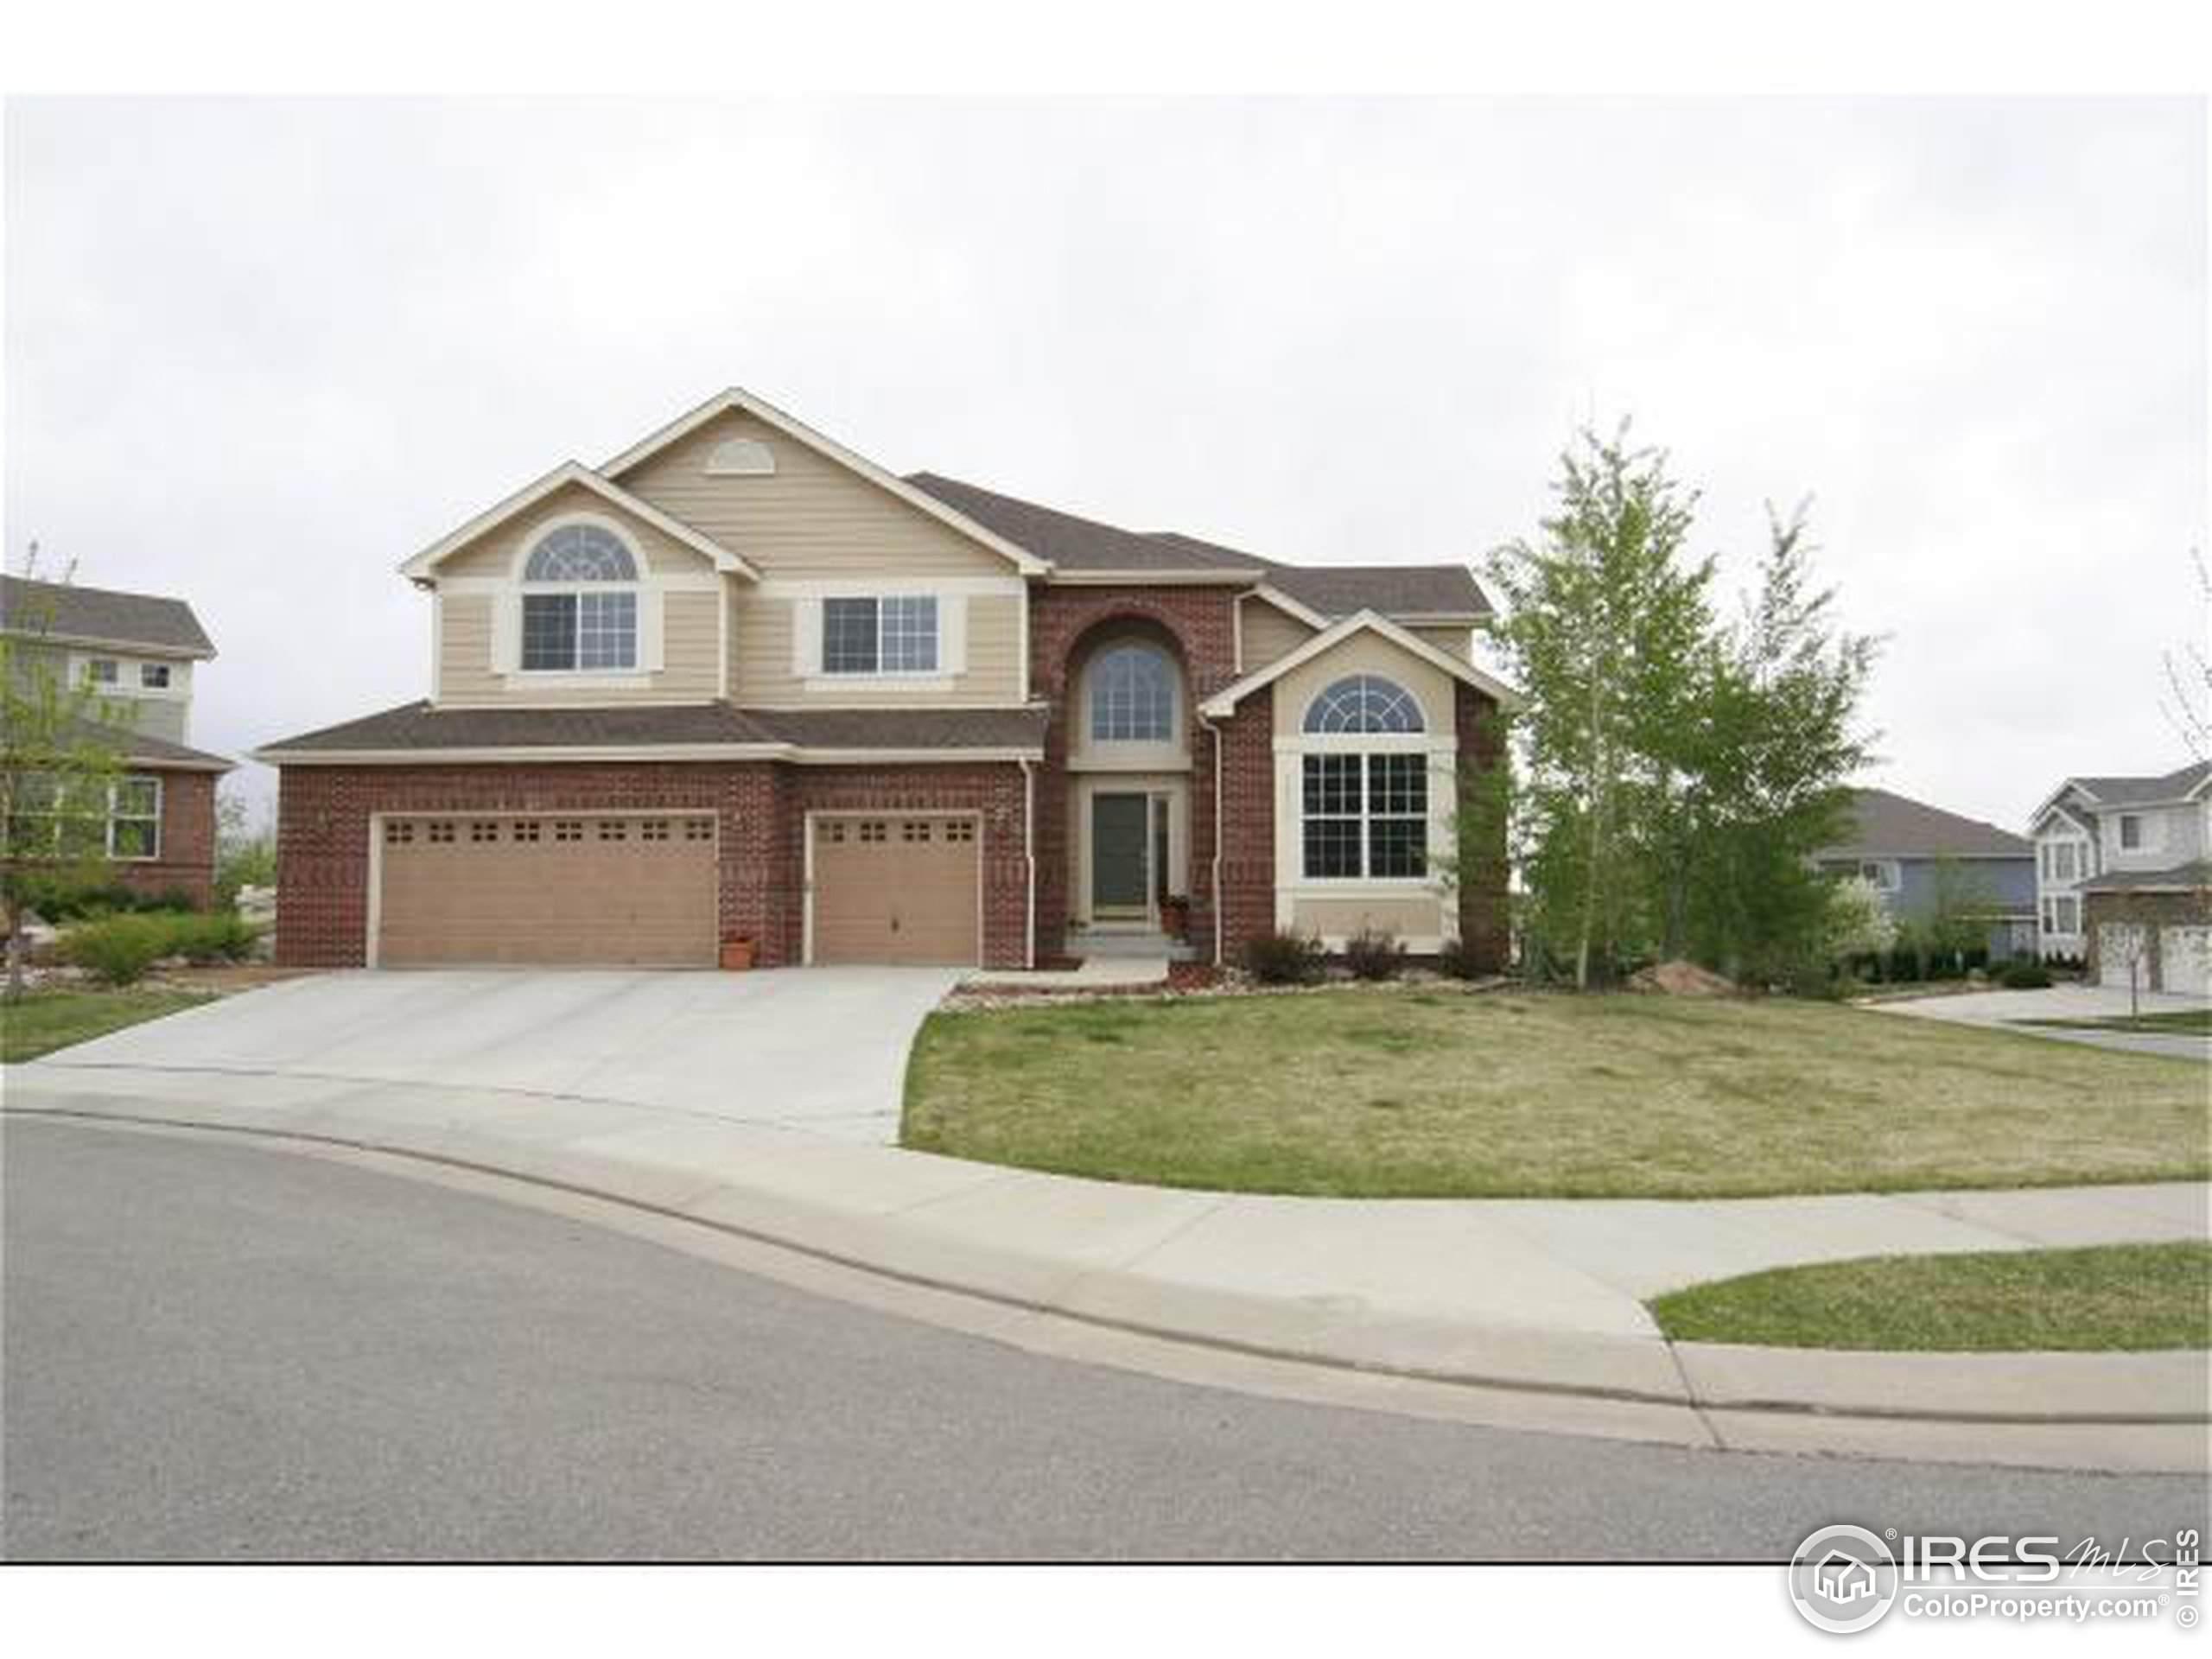 133 W 4th St, Loveland, CO 80537 (MLS #866934) :: 8z Real Estate